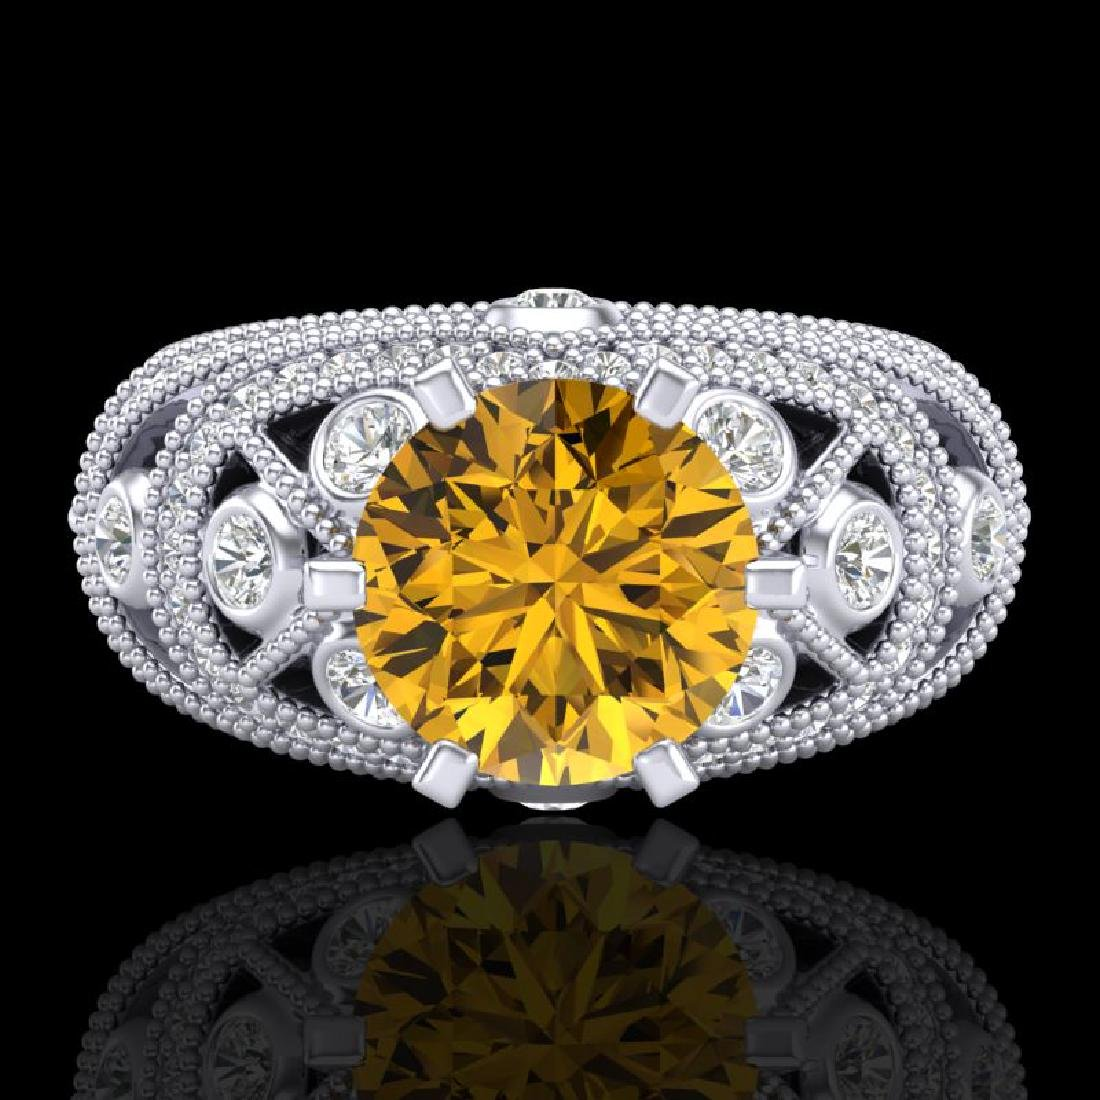 2 CTW Intense Yellow Diamond Solitaire Engagement Art - 2